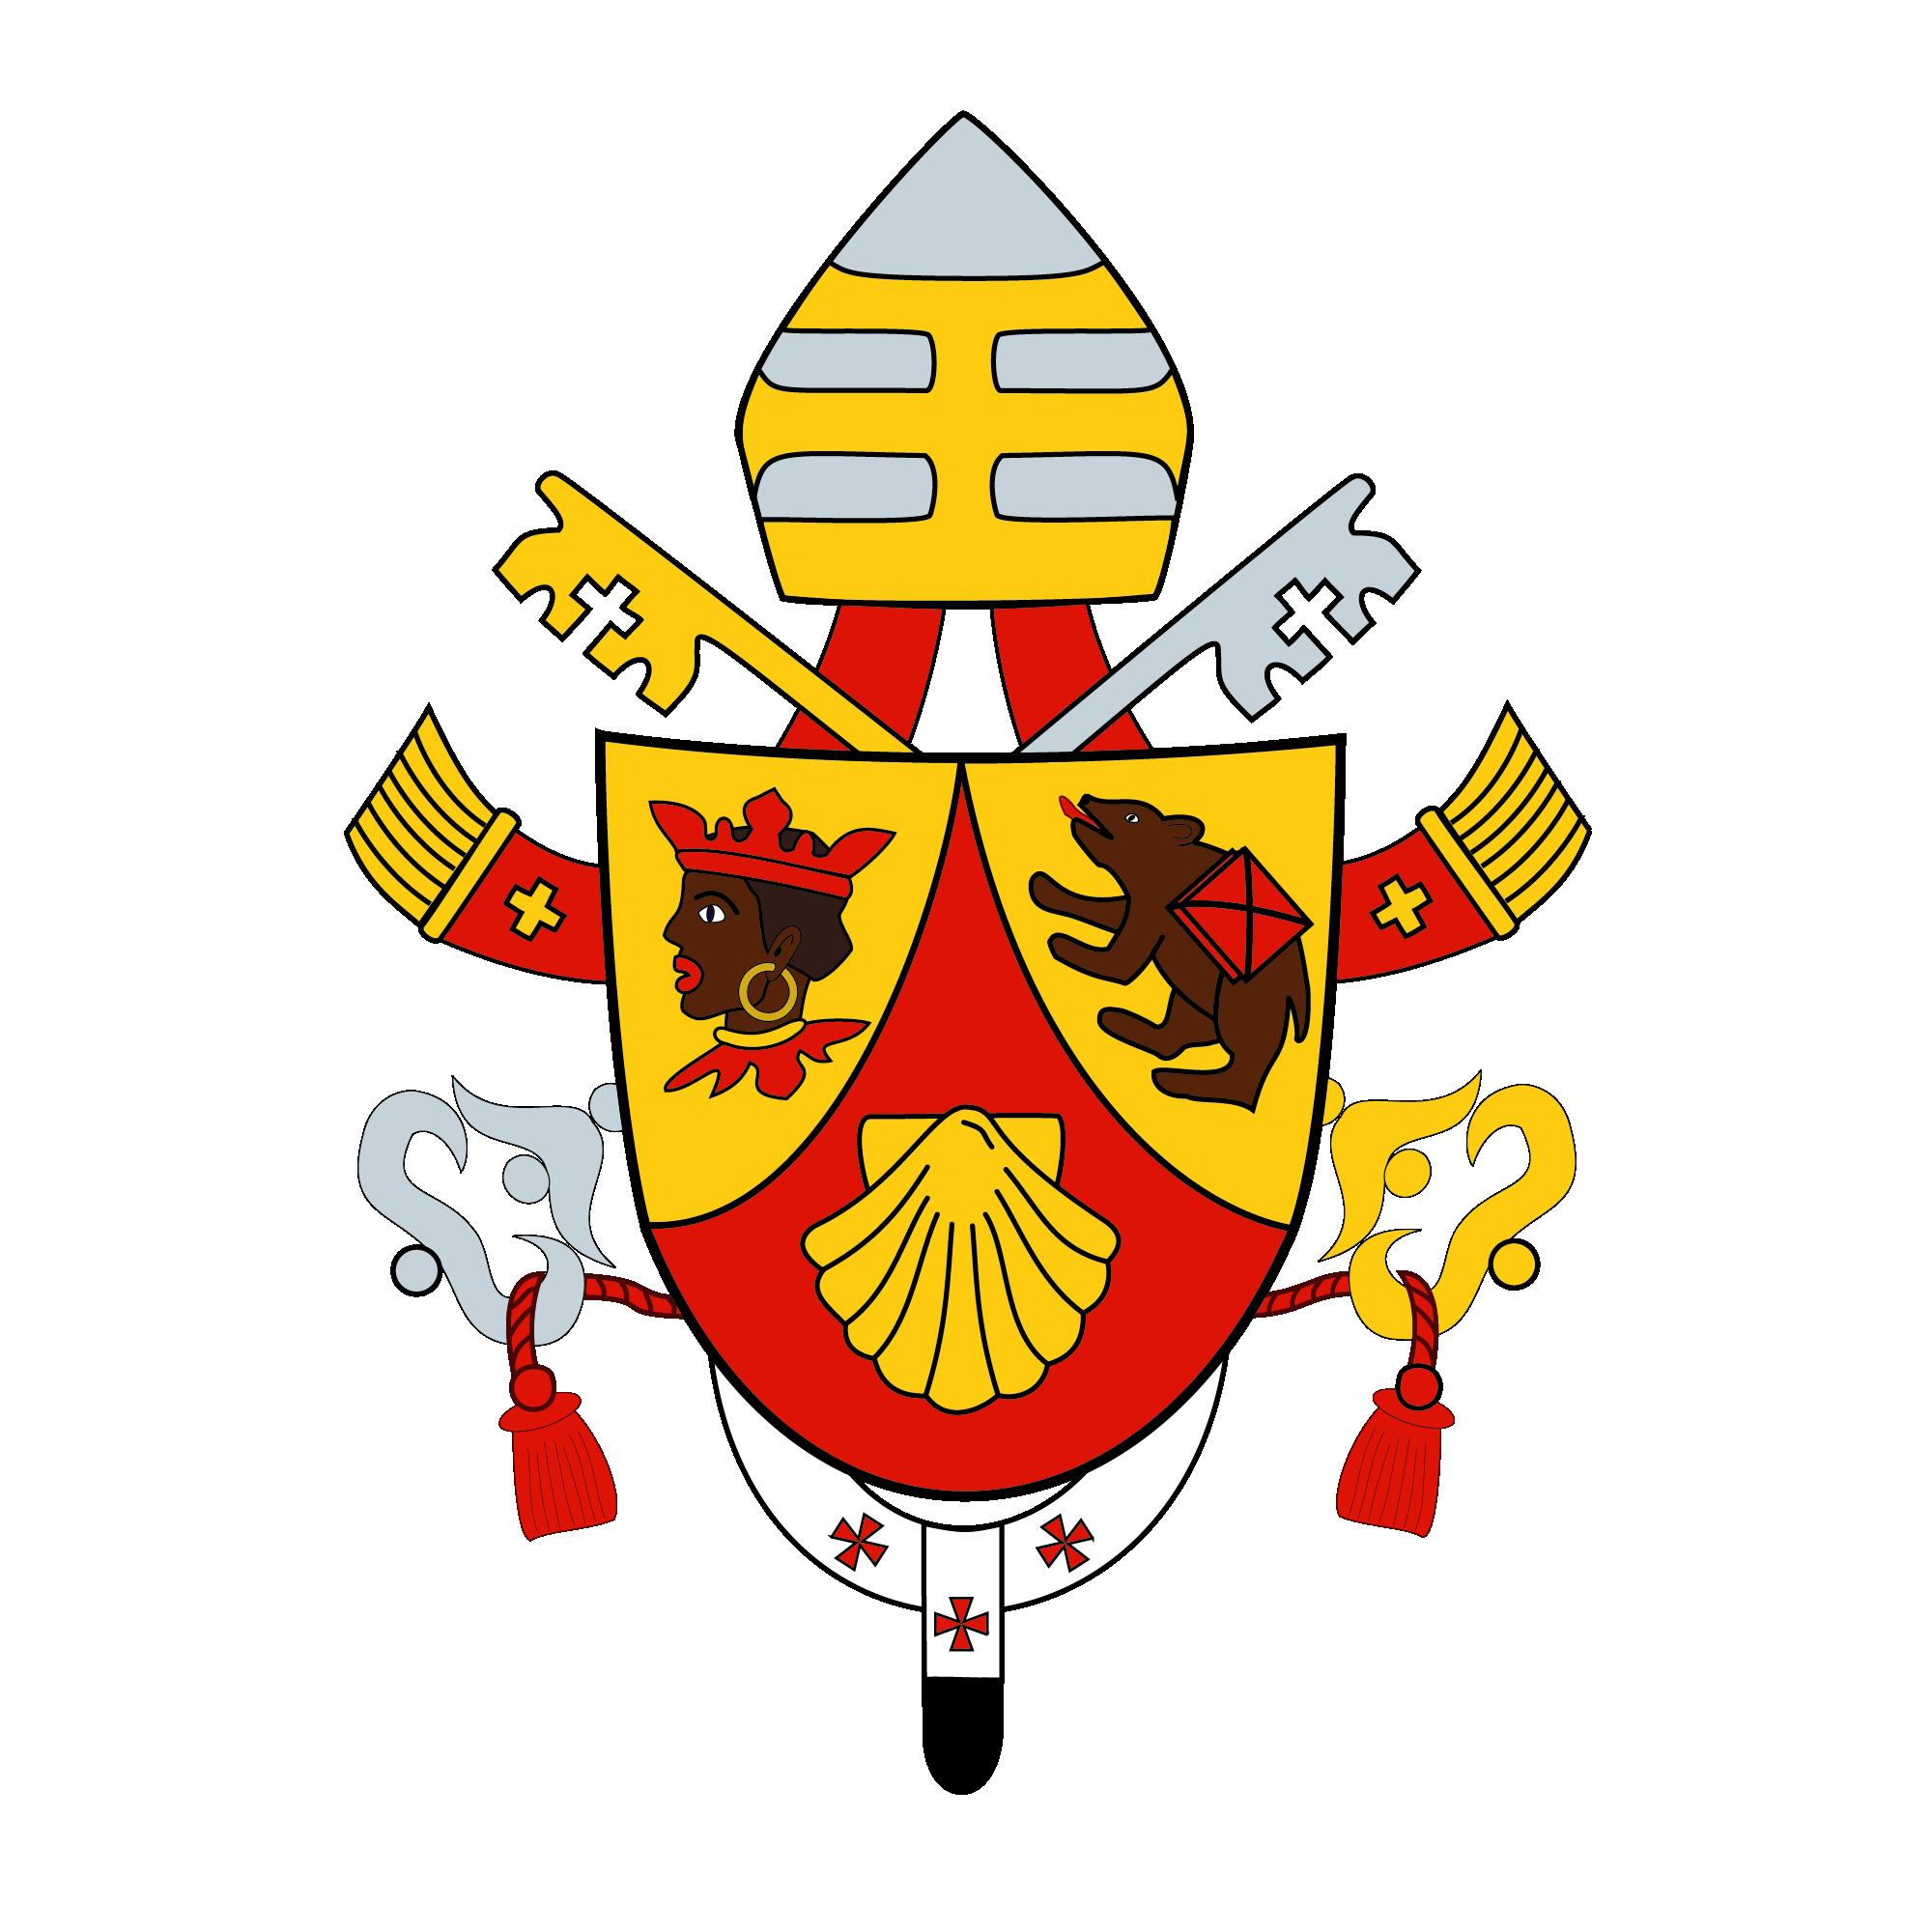 2005: Deutscher Papst Benedikt XVI.